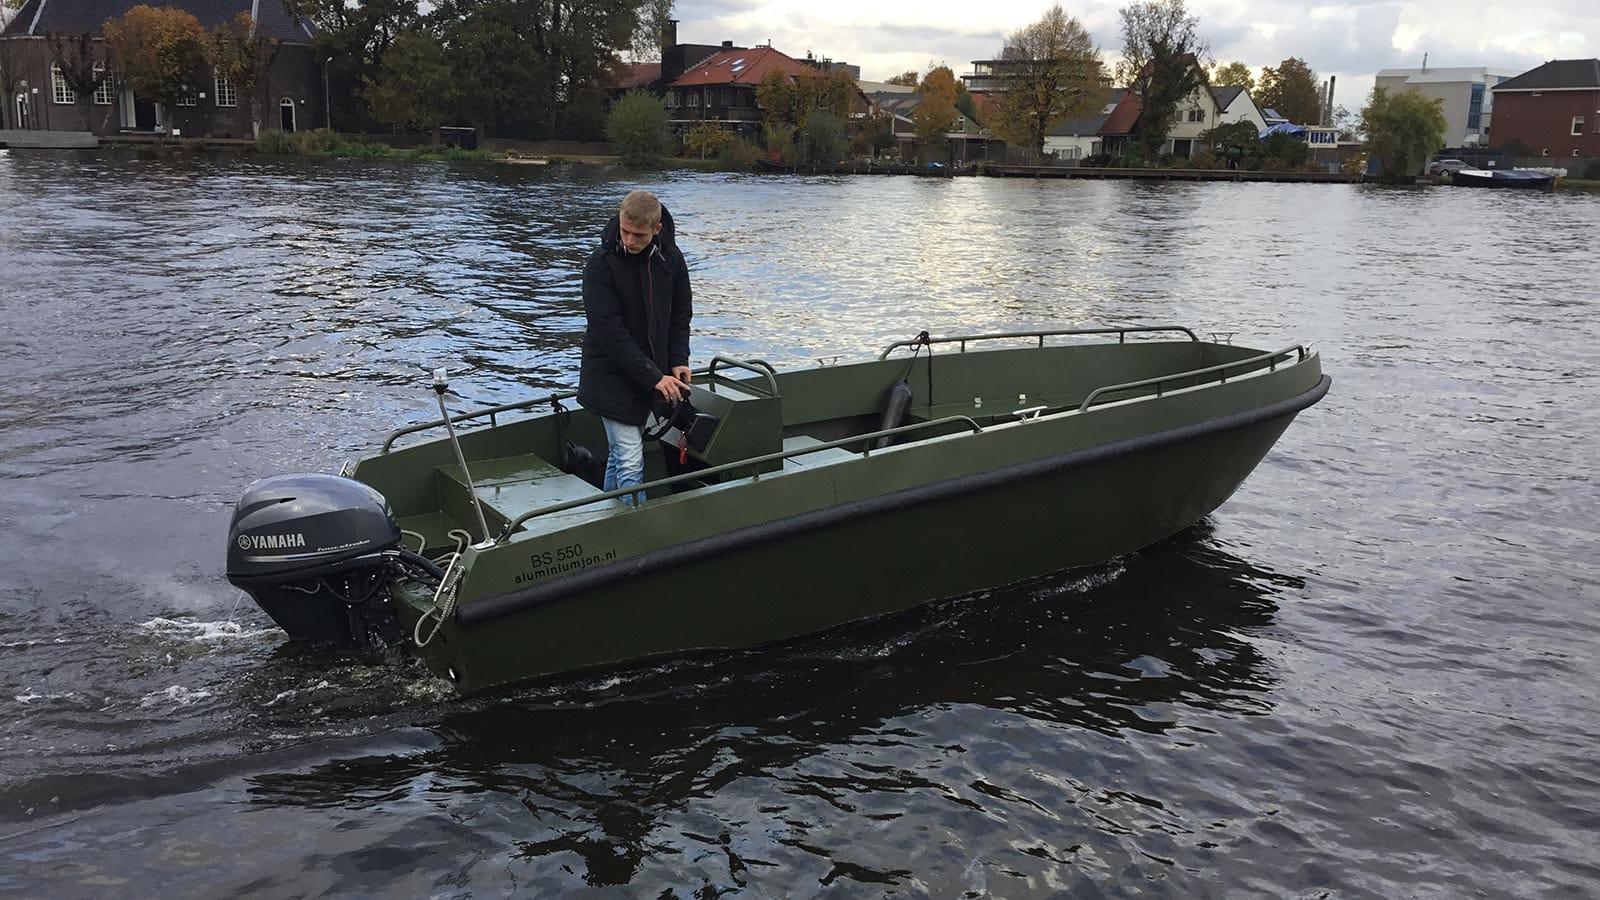 AluminiumJon.nl-Bs 600-with Yamaha outboard motor